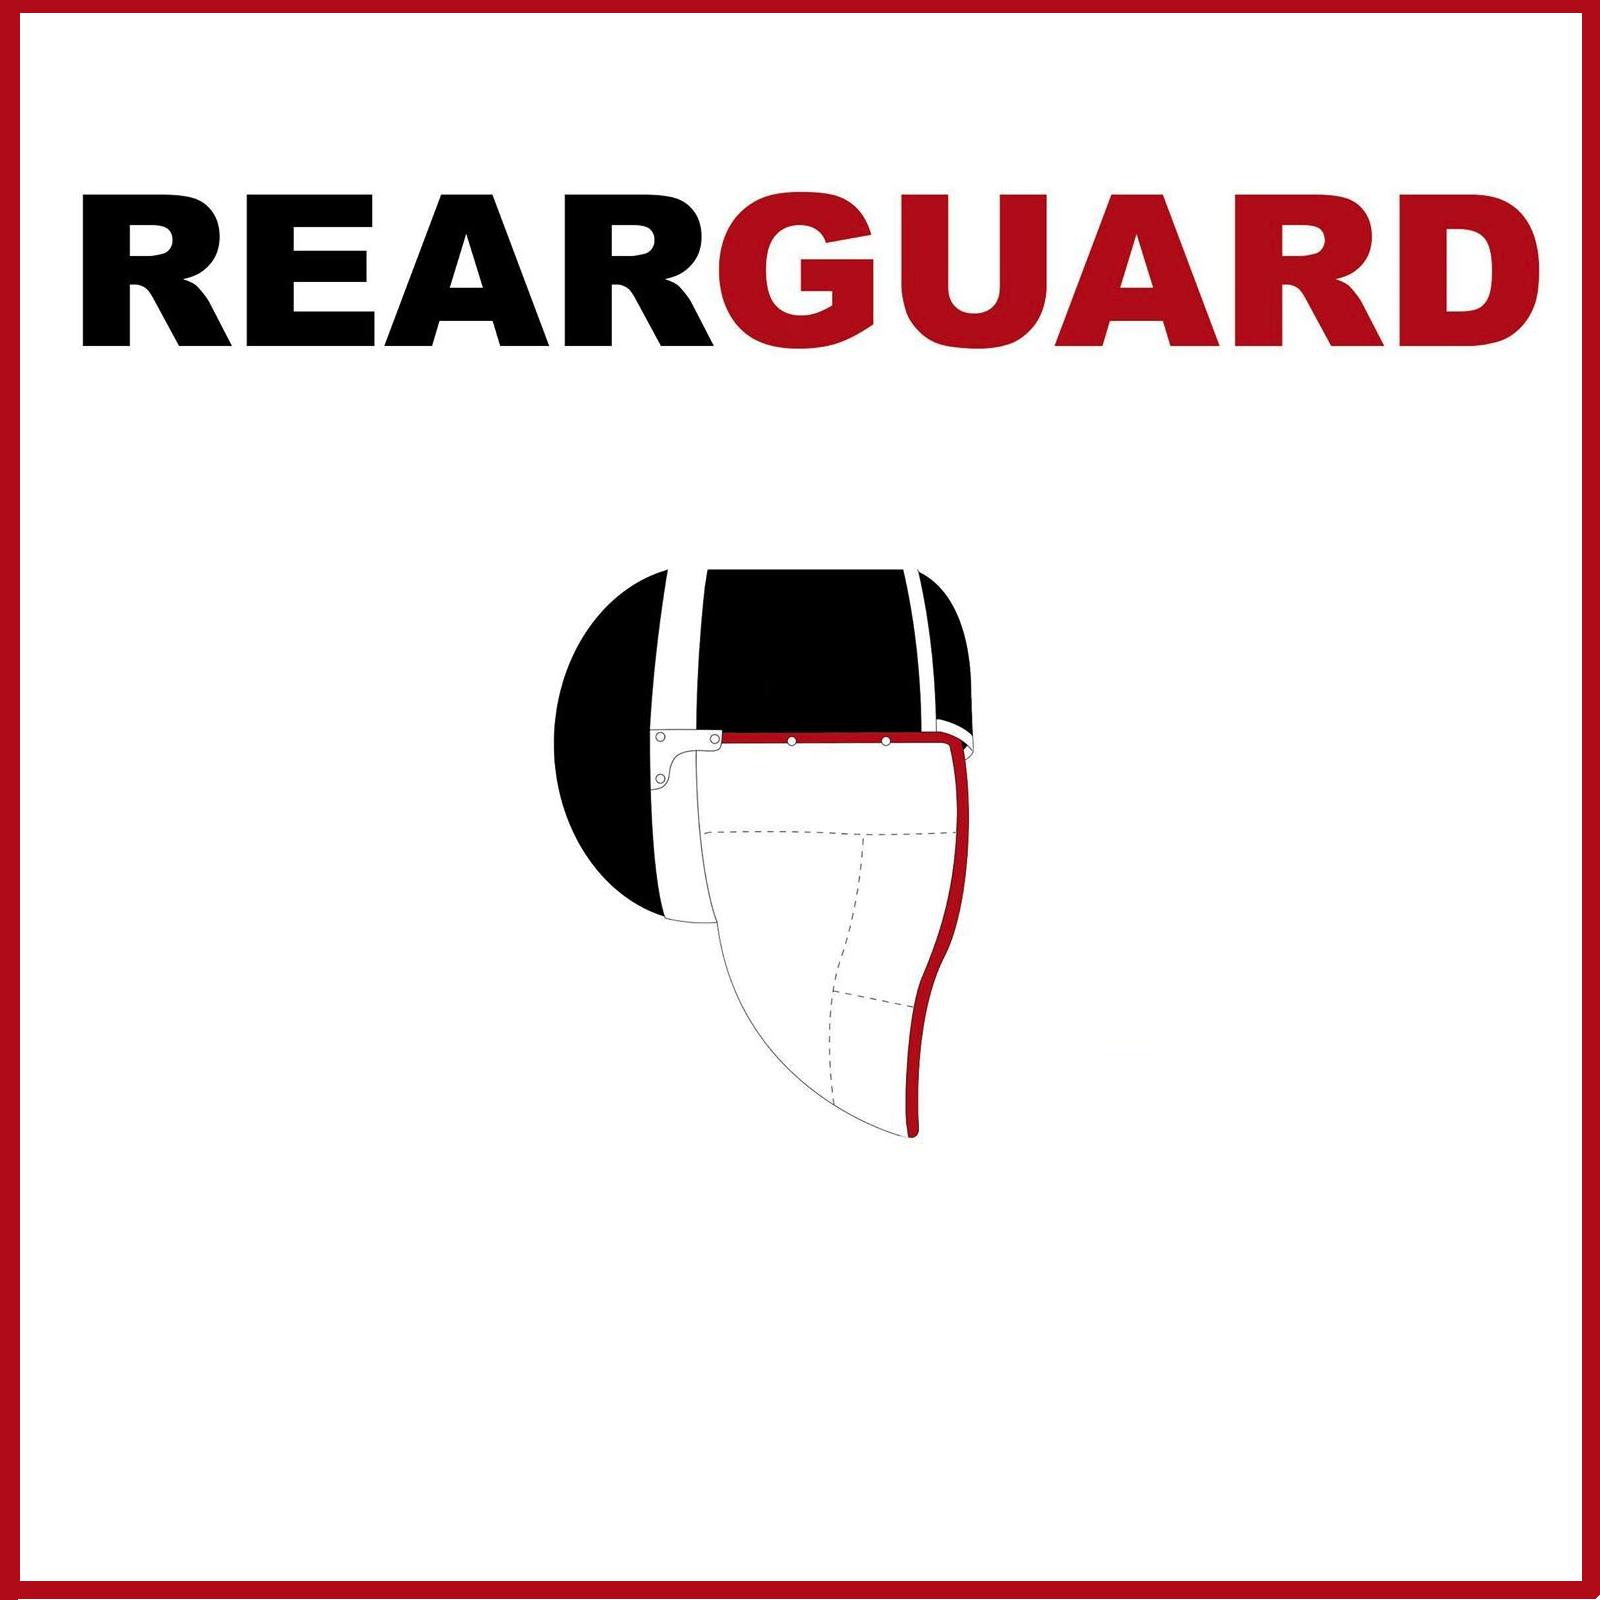 RearGuardLogoSquare.png